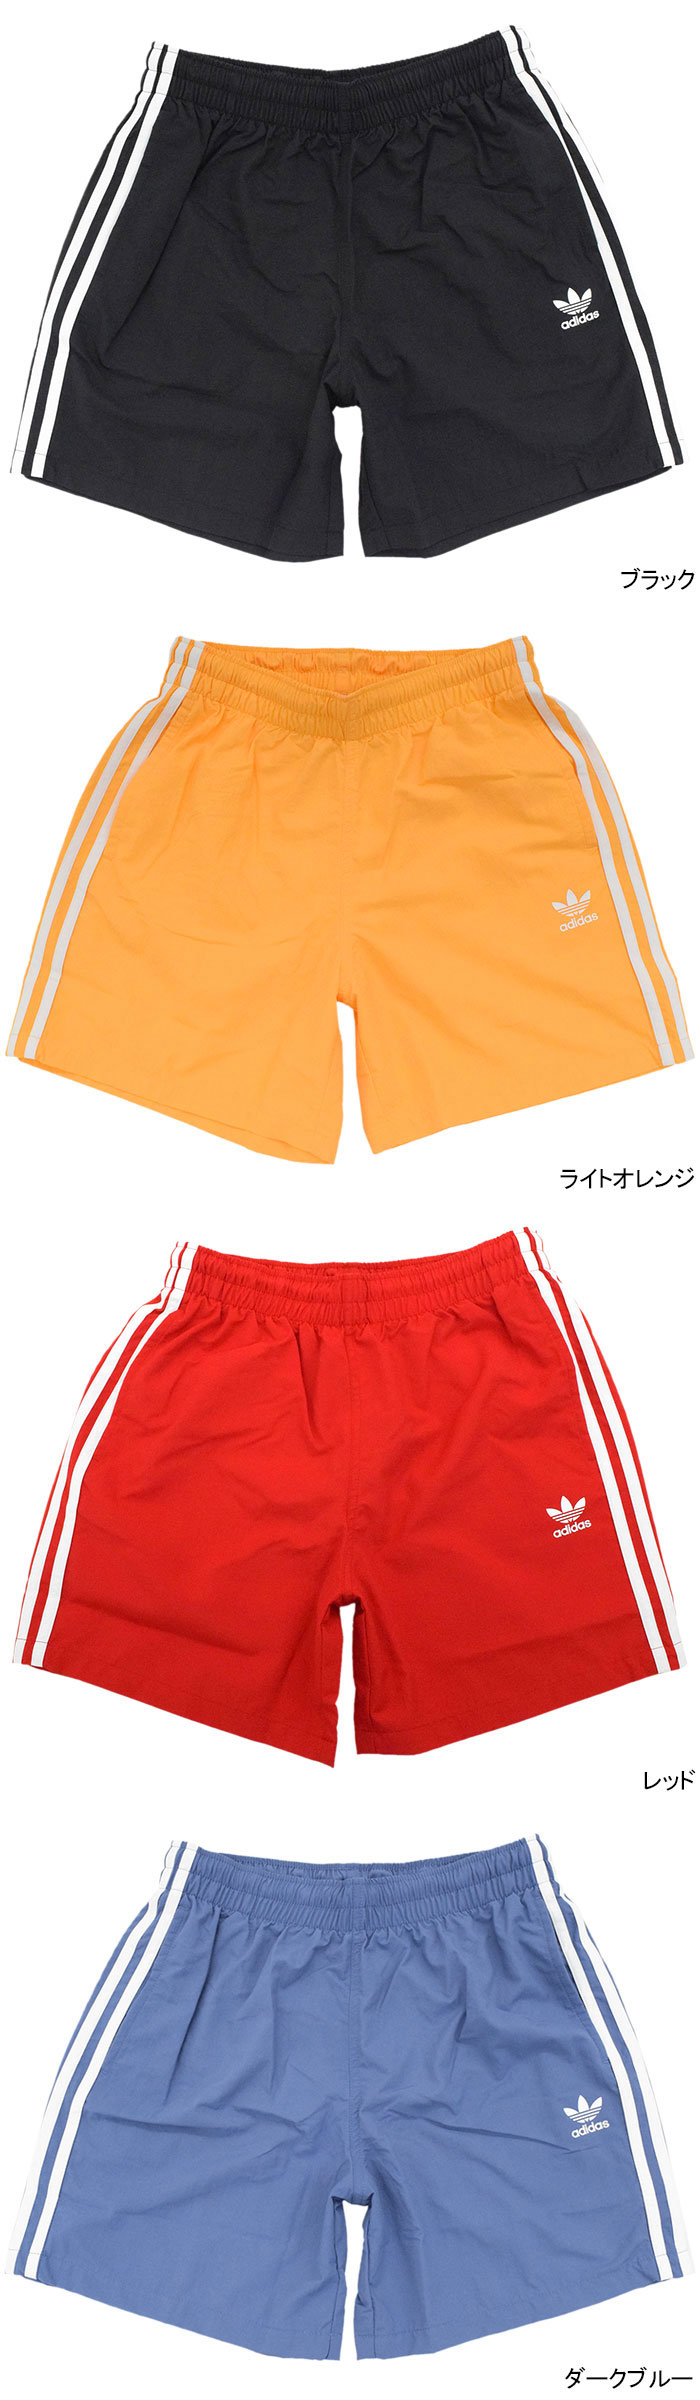 adidasアディダスの水着 3 Stripes Swim Short06